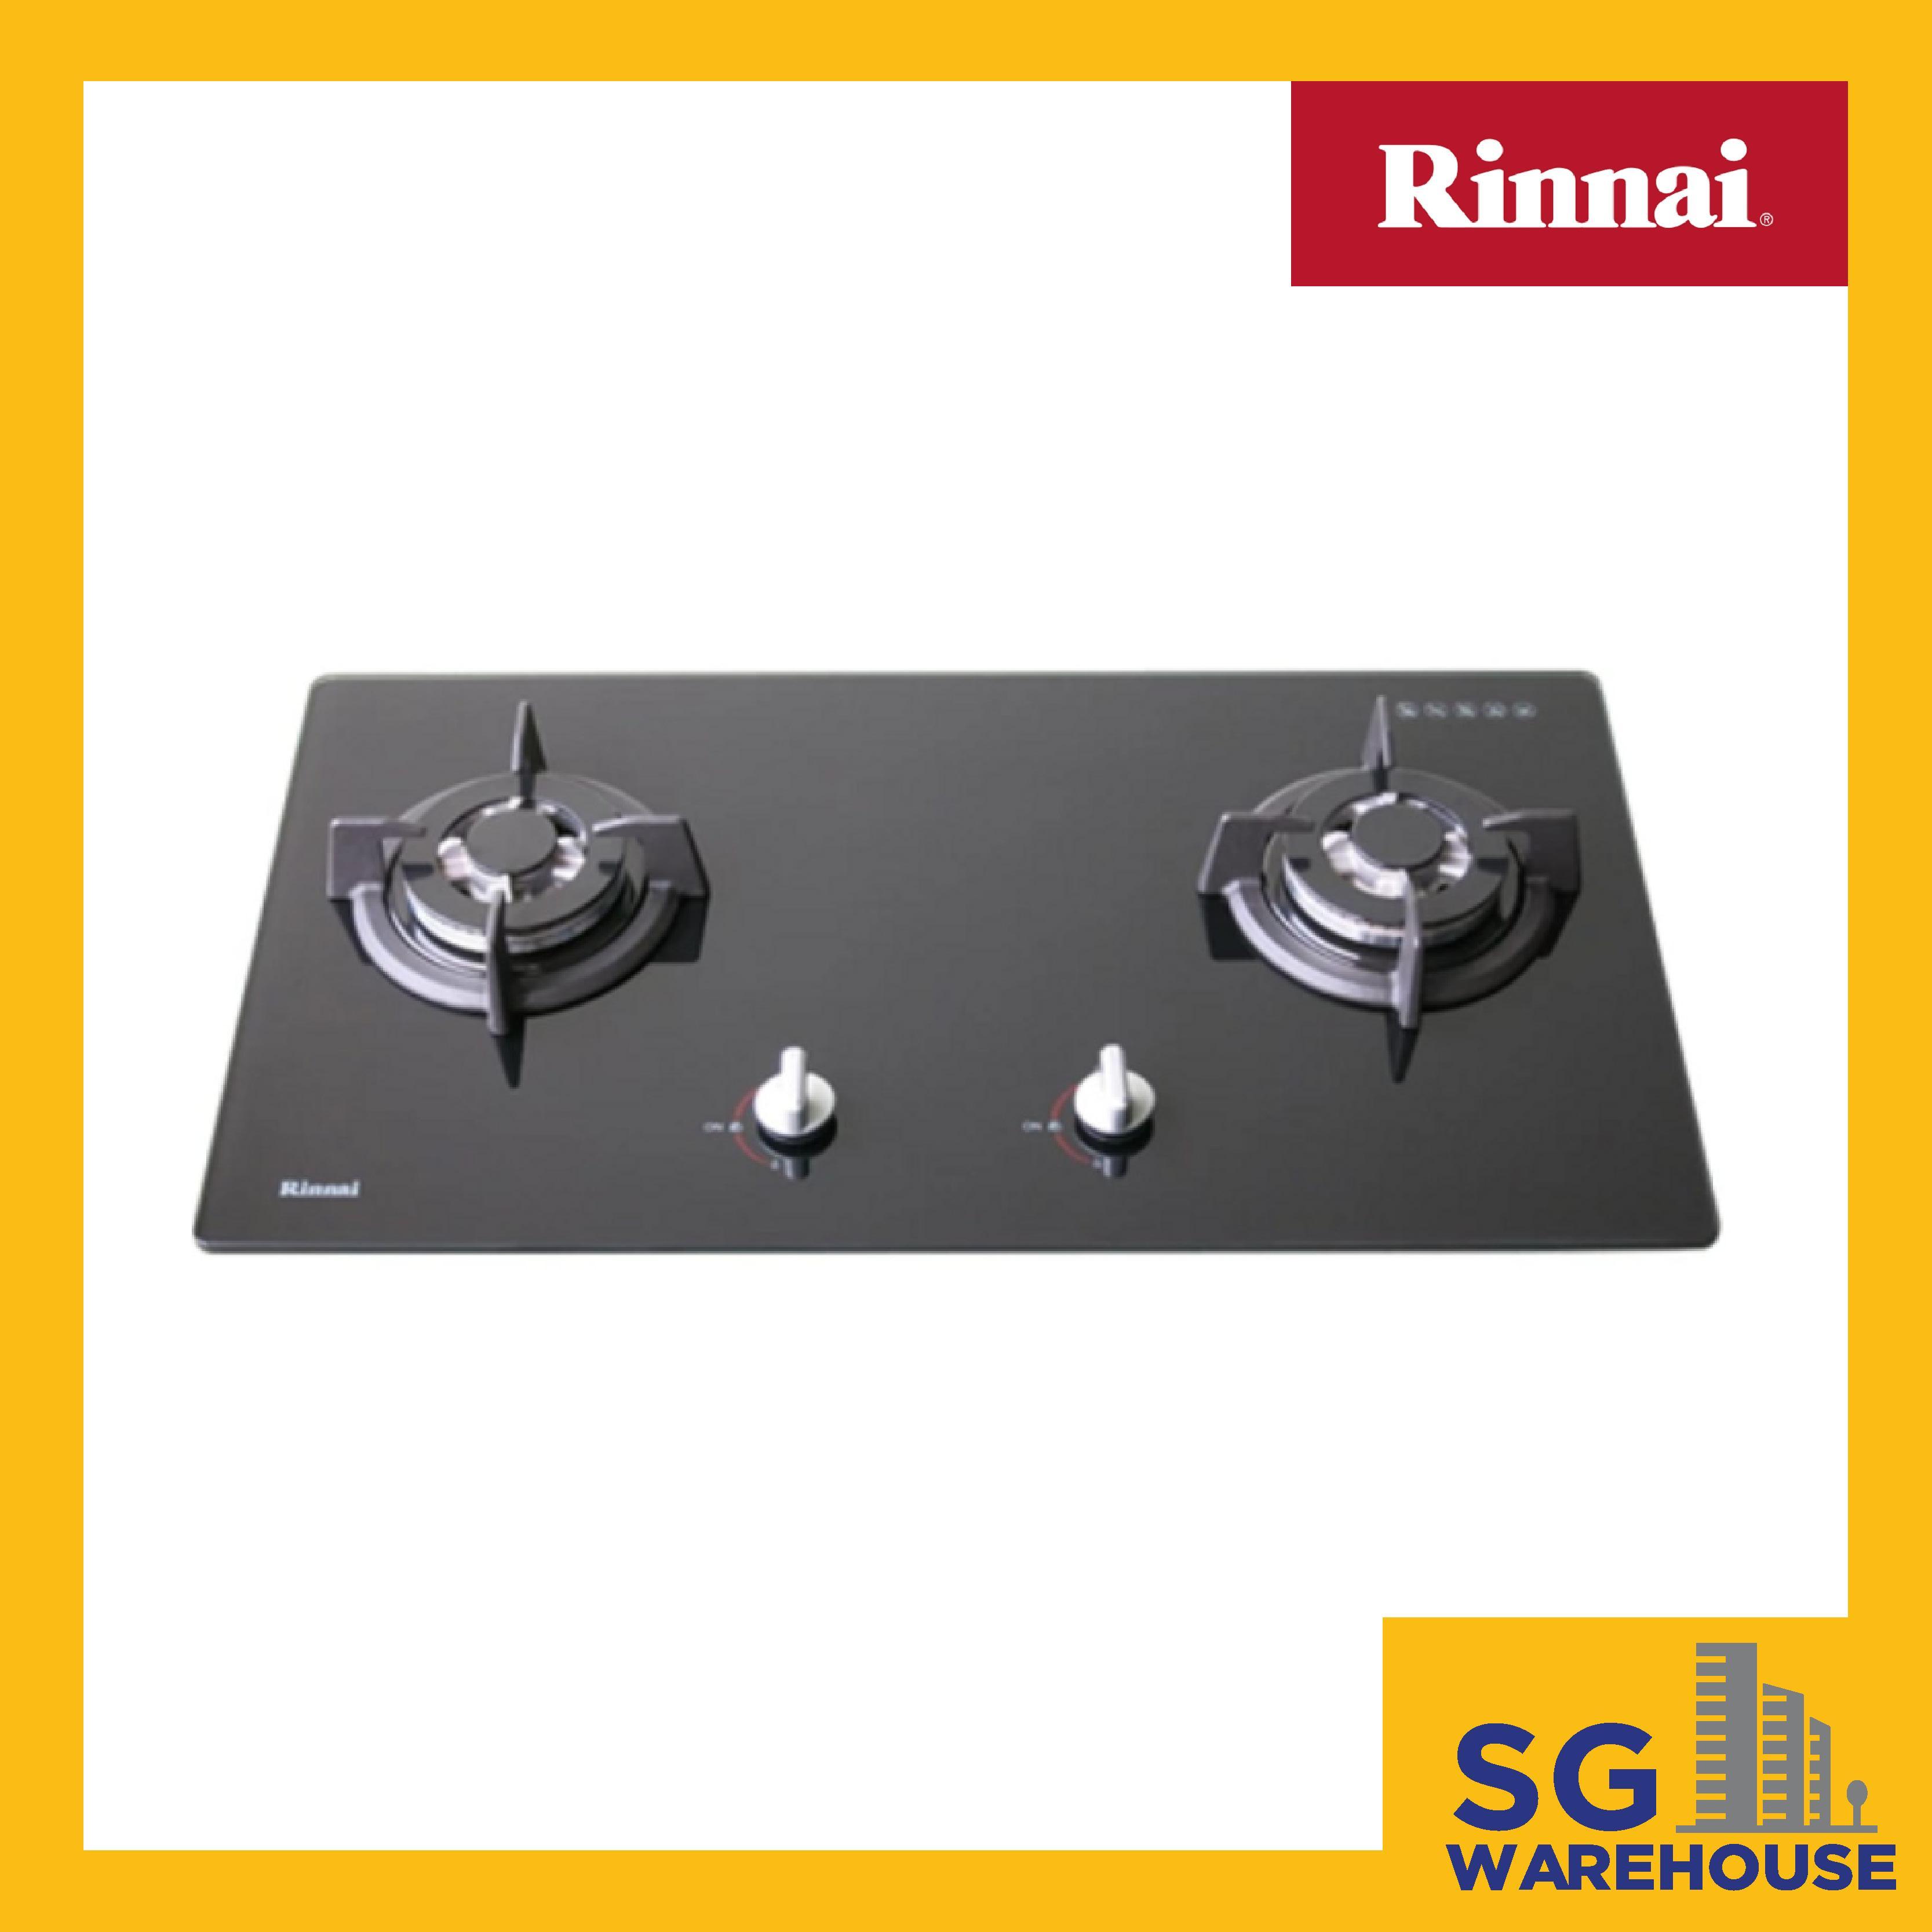 Rb-7302s-Gbs Rinnai Glass Hob.